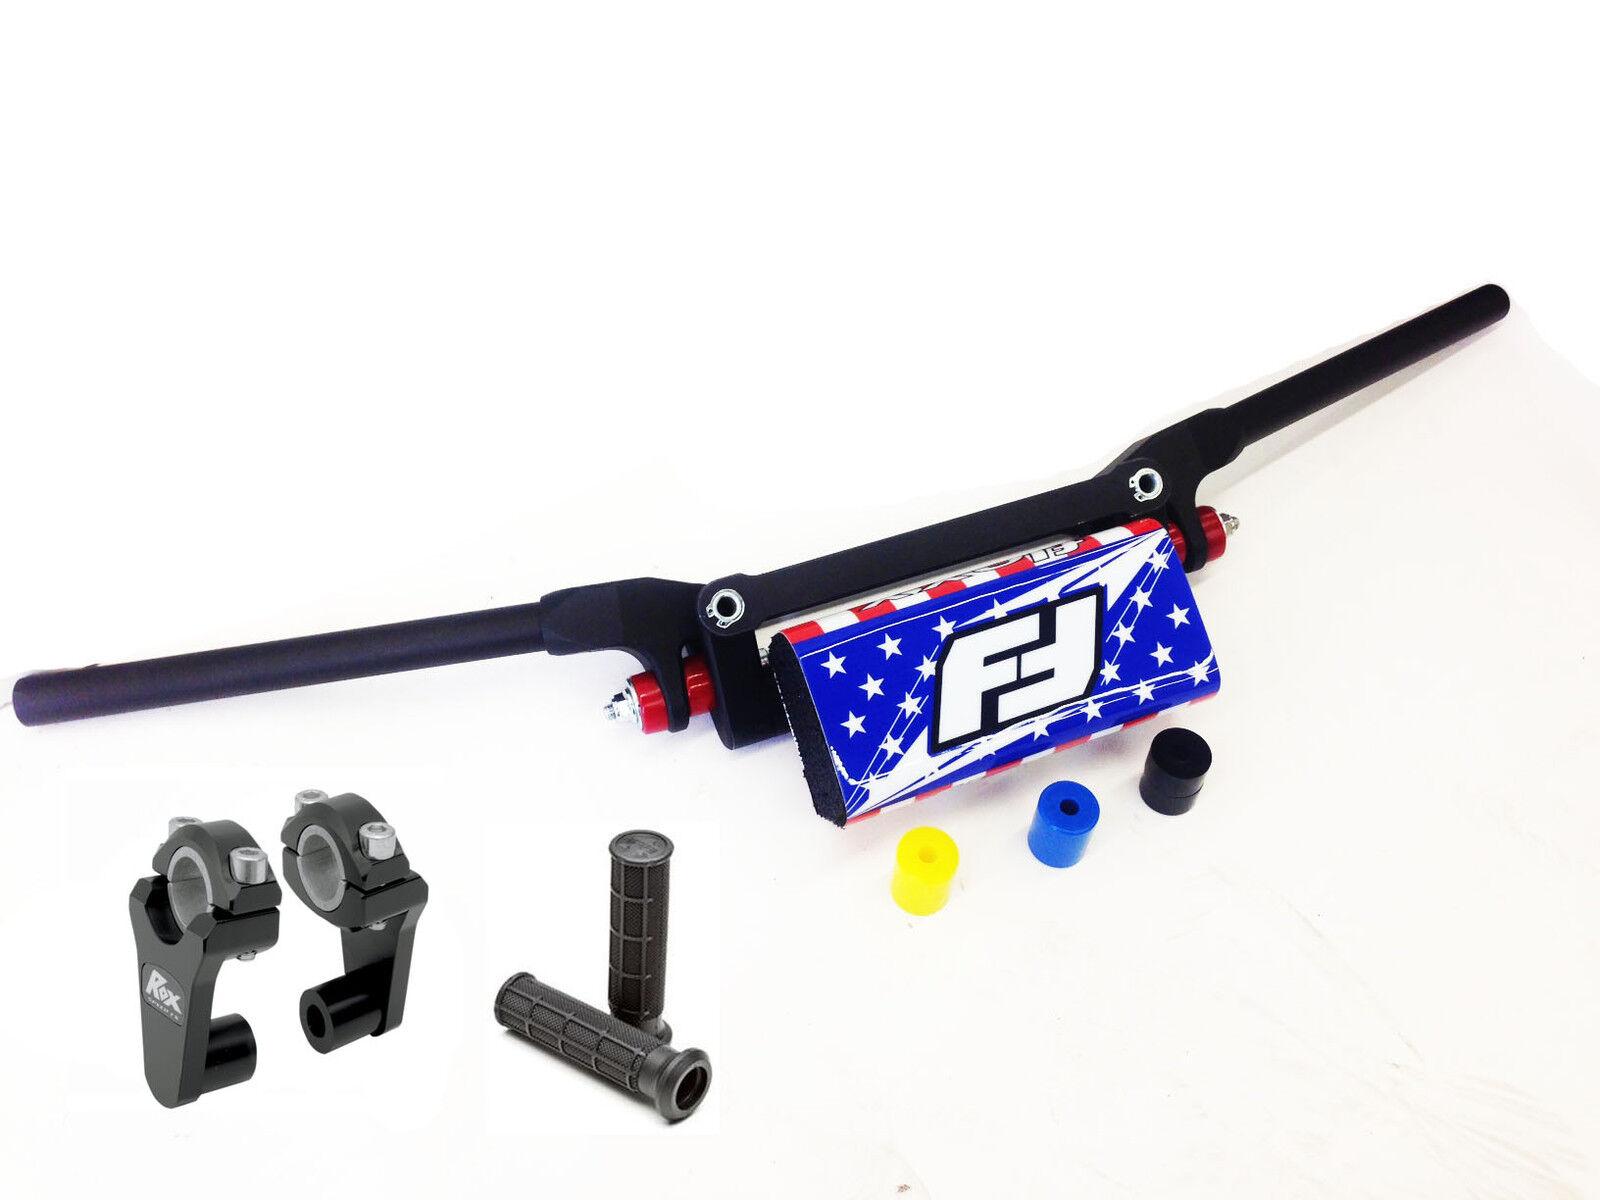 Fasst Flexx Flex 12 Grad Enduro Lenker USA Pad + Rox 2   Heber Schnell